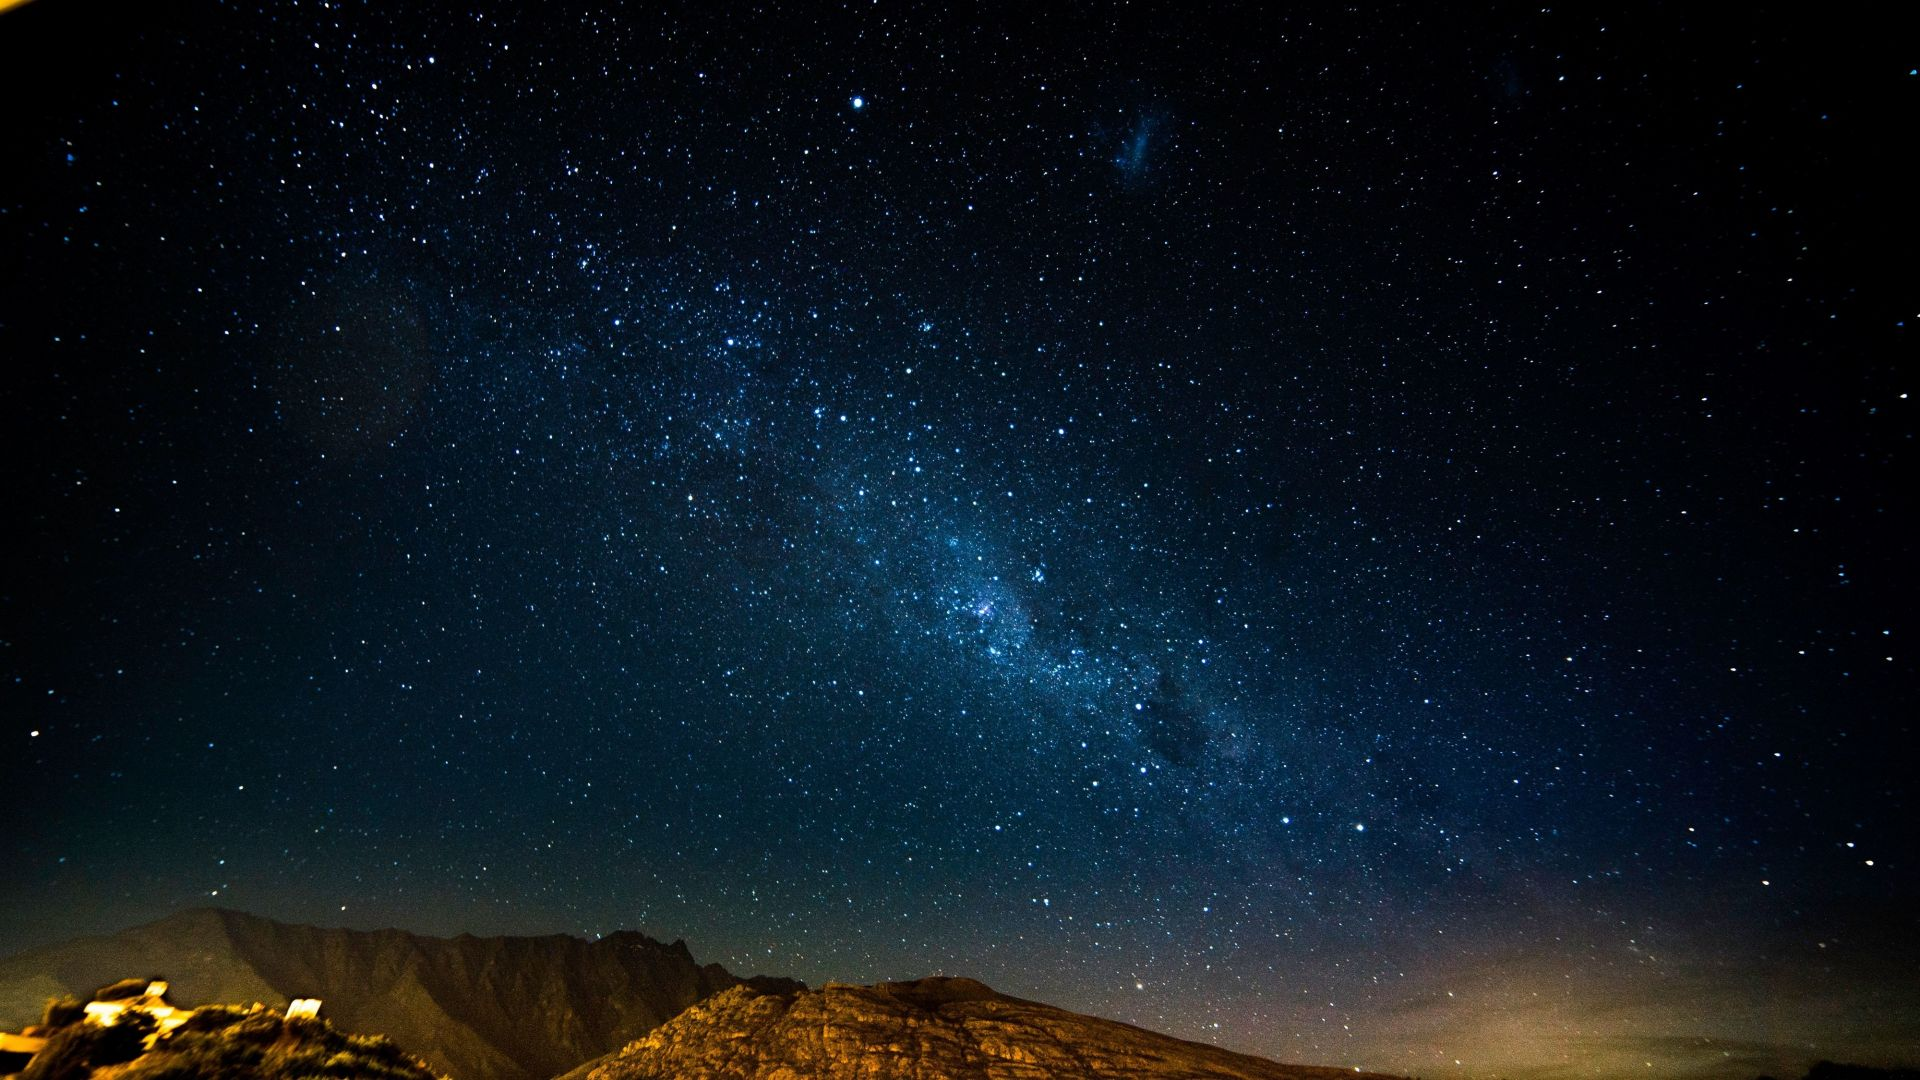 Desktop Wallpaper Starry Night Mountains Radiance Stars